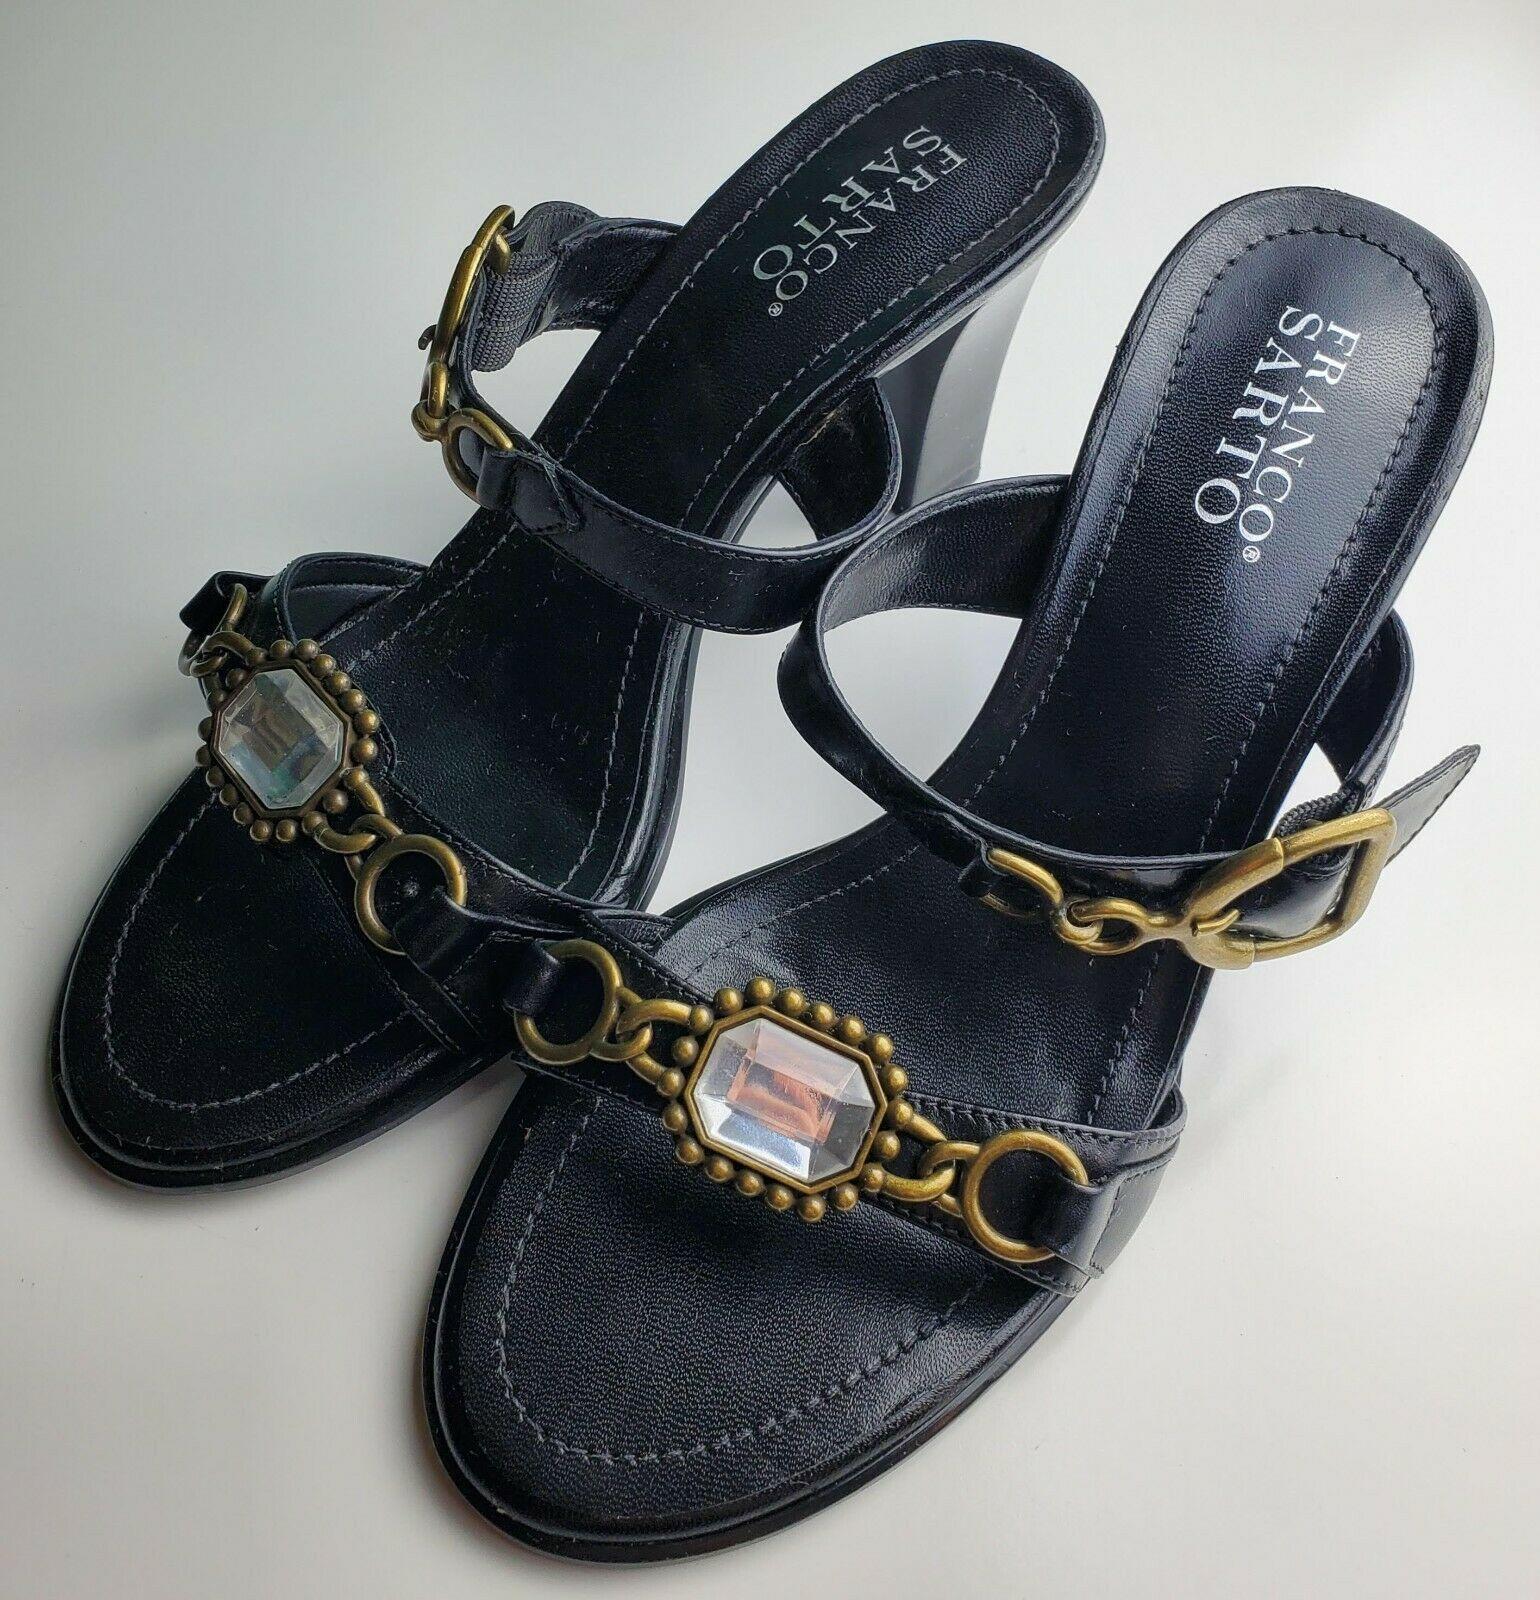 Franco Sarto Black Two Strap Women's Heels With Jewel Size 8.5 image 4